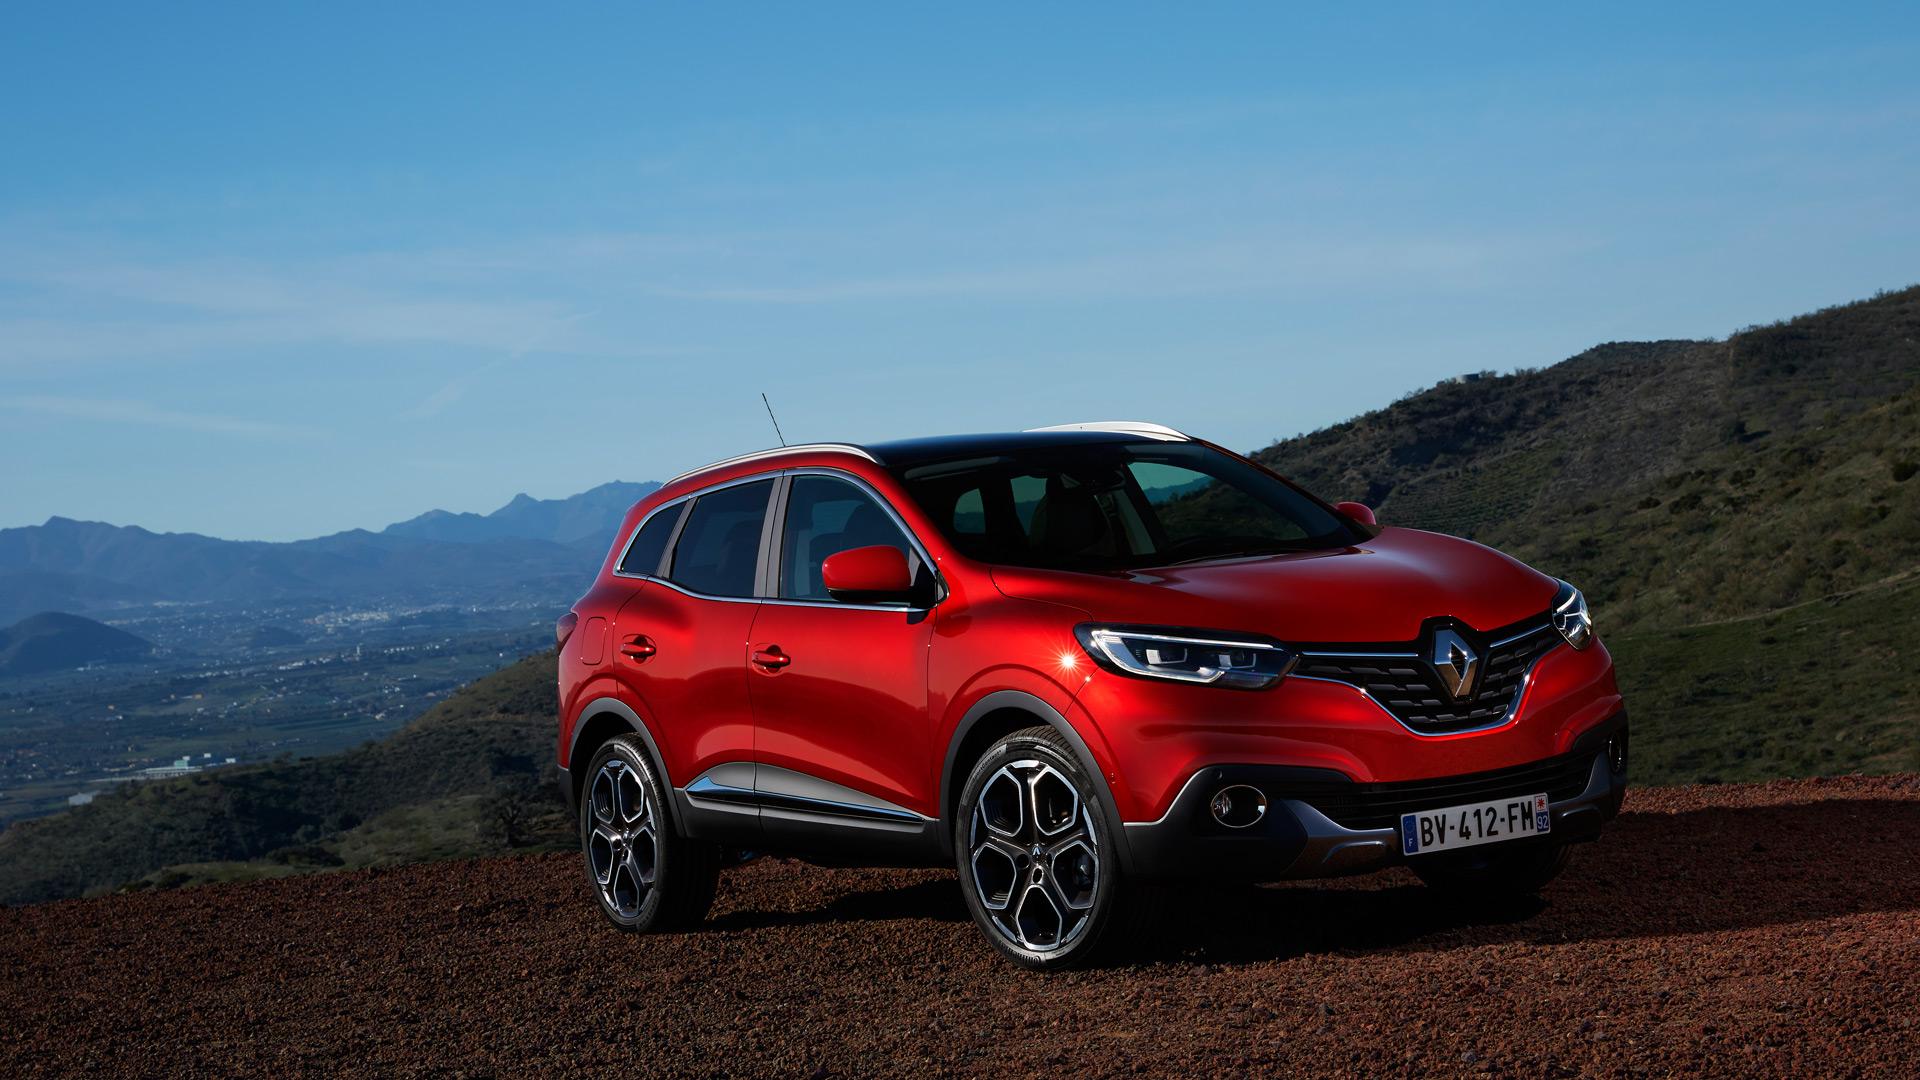 Il Nuovo Renault Kadjar